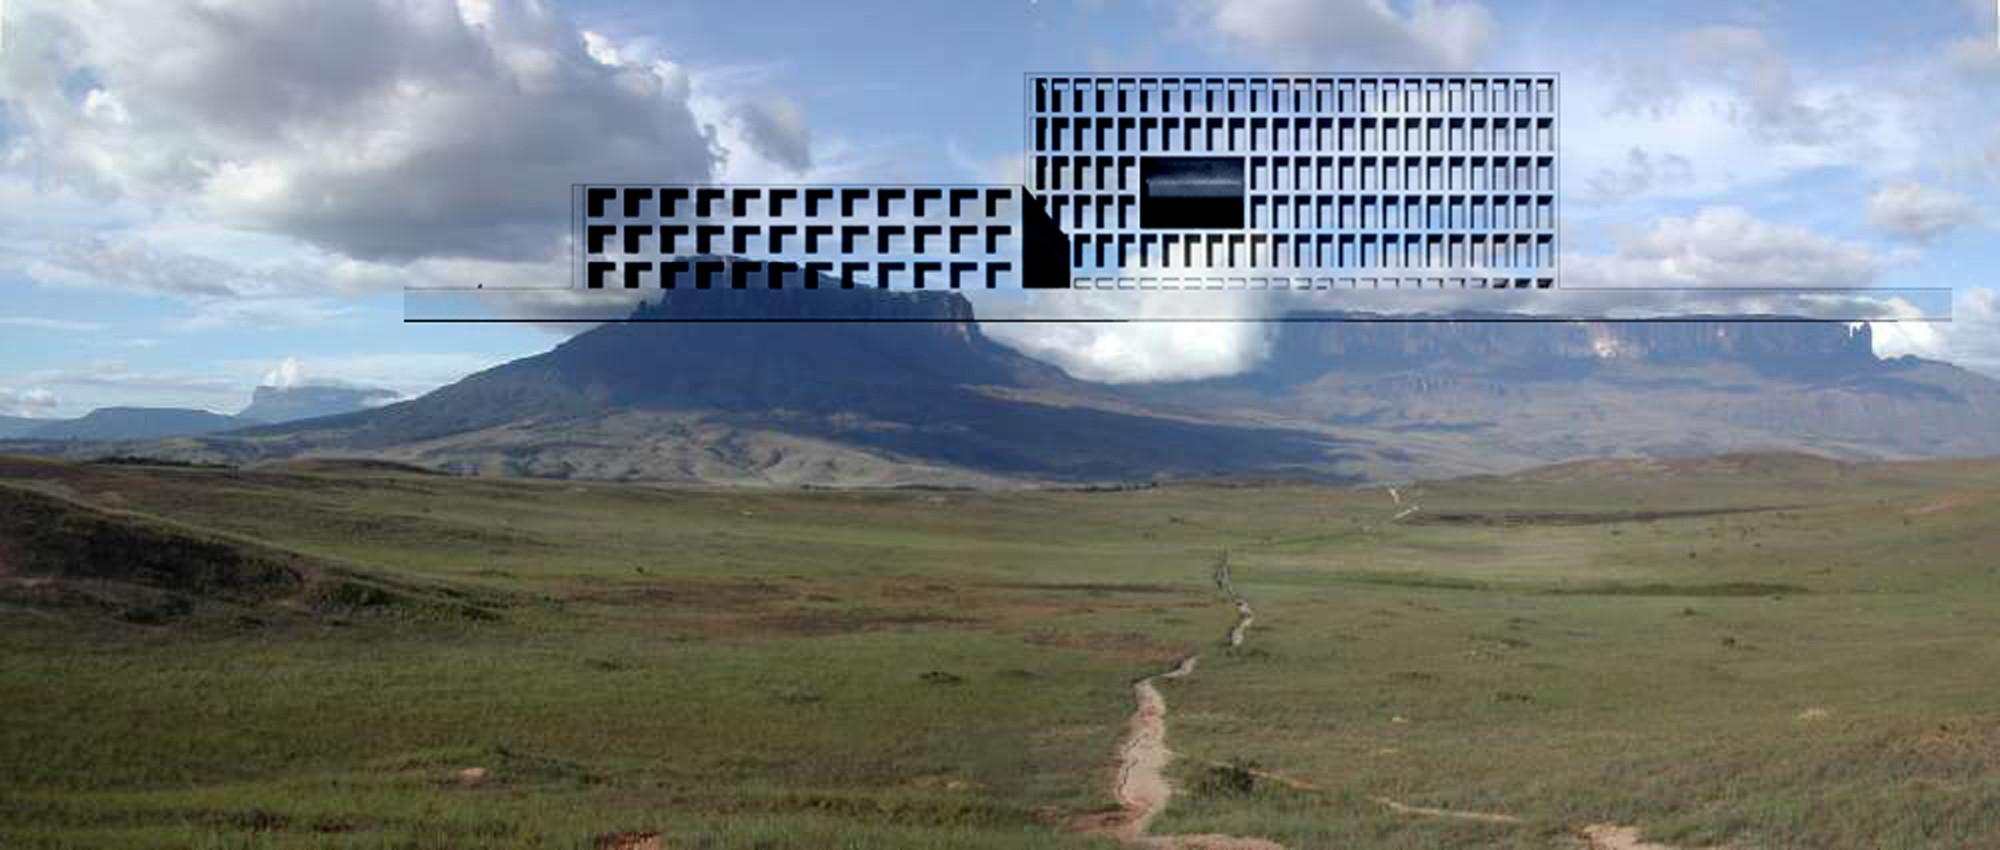 Imagen conceptual. Image Cortesia de adjkm + Montemayor Arquitectos + VEPICA